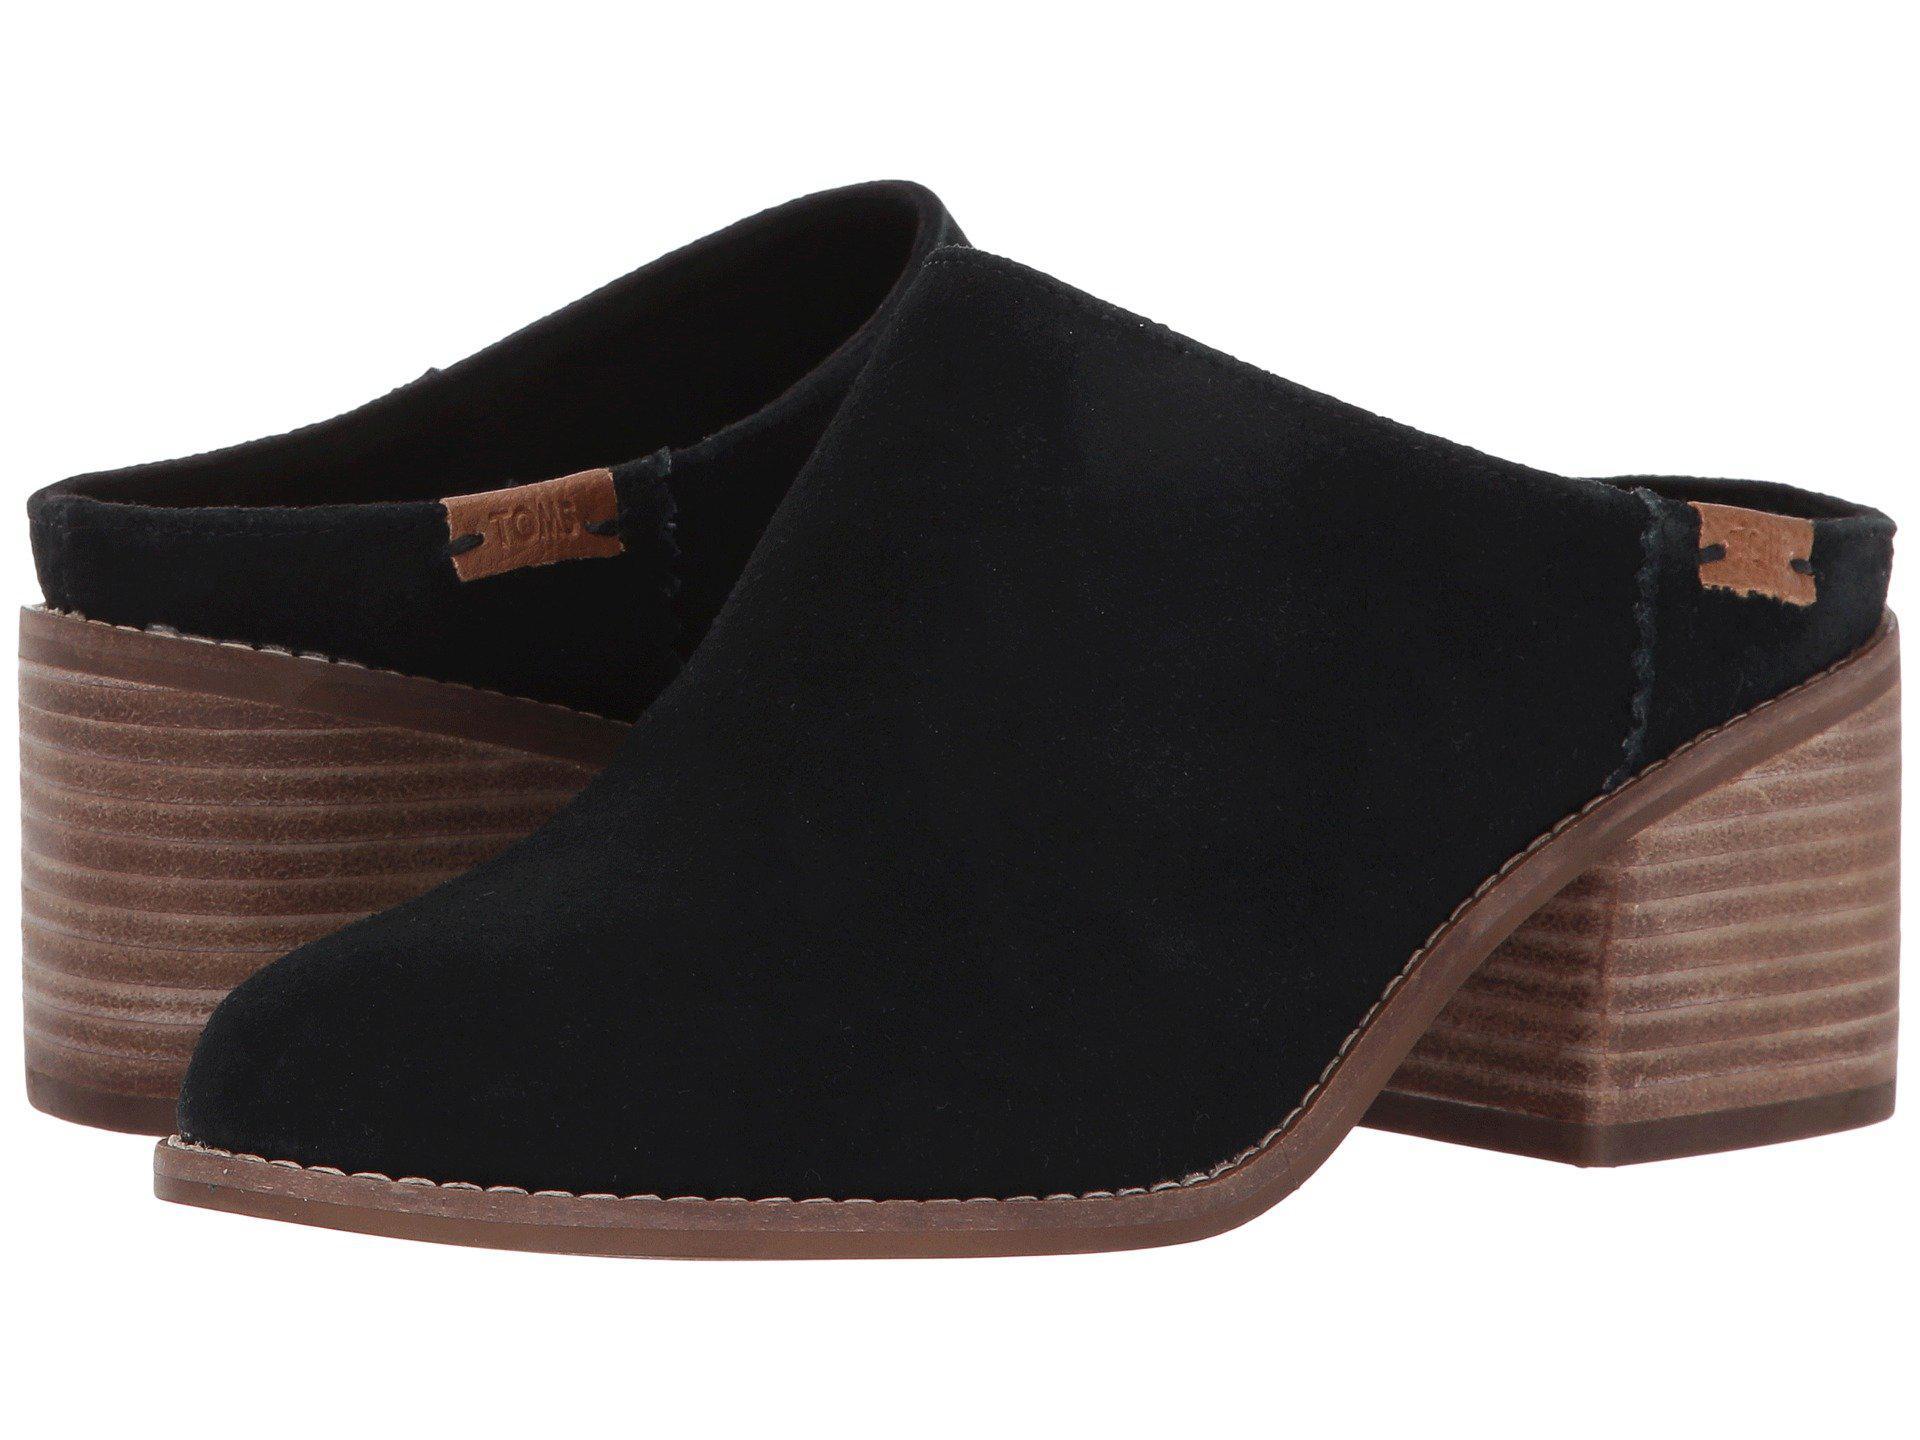 c95a93f3b0e Lyst - TOMS Leila Black Suede Heel Mule in Black - Save 58%